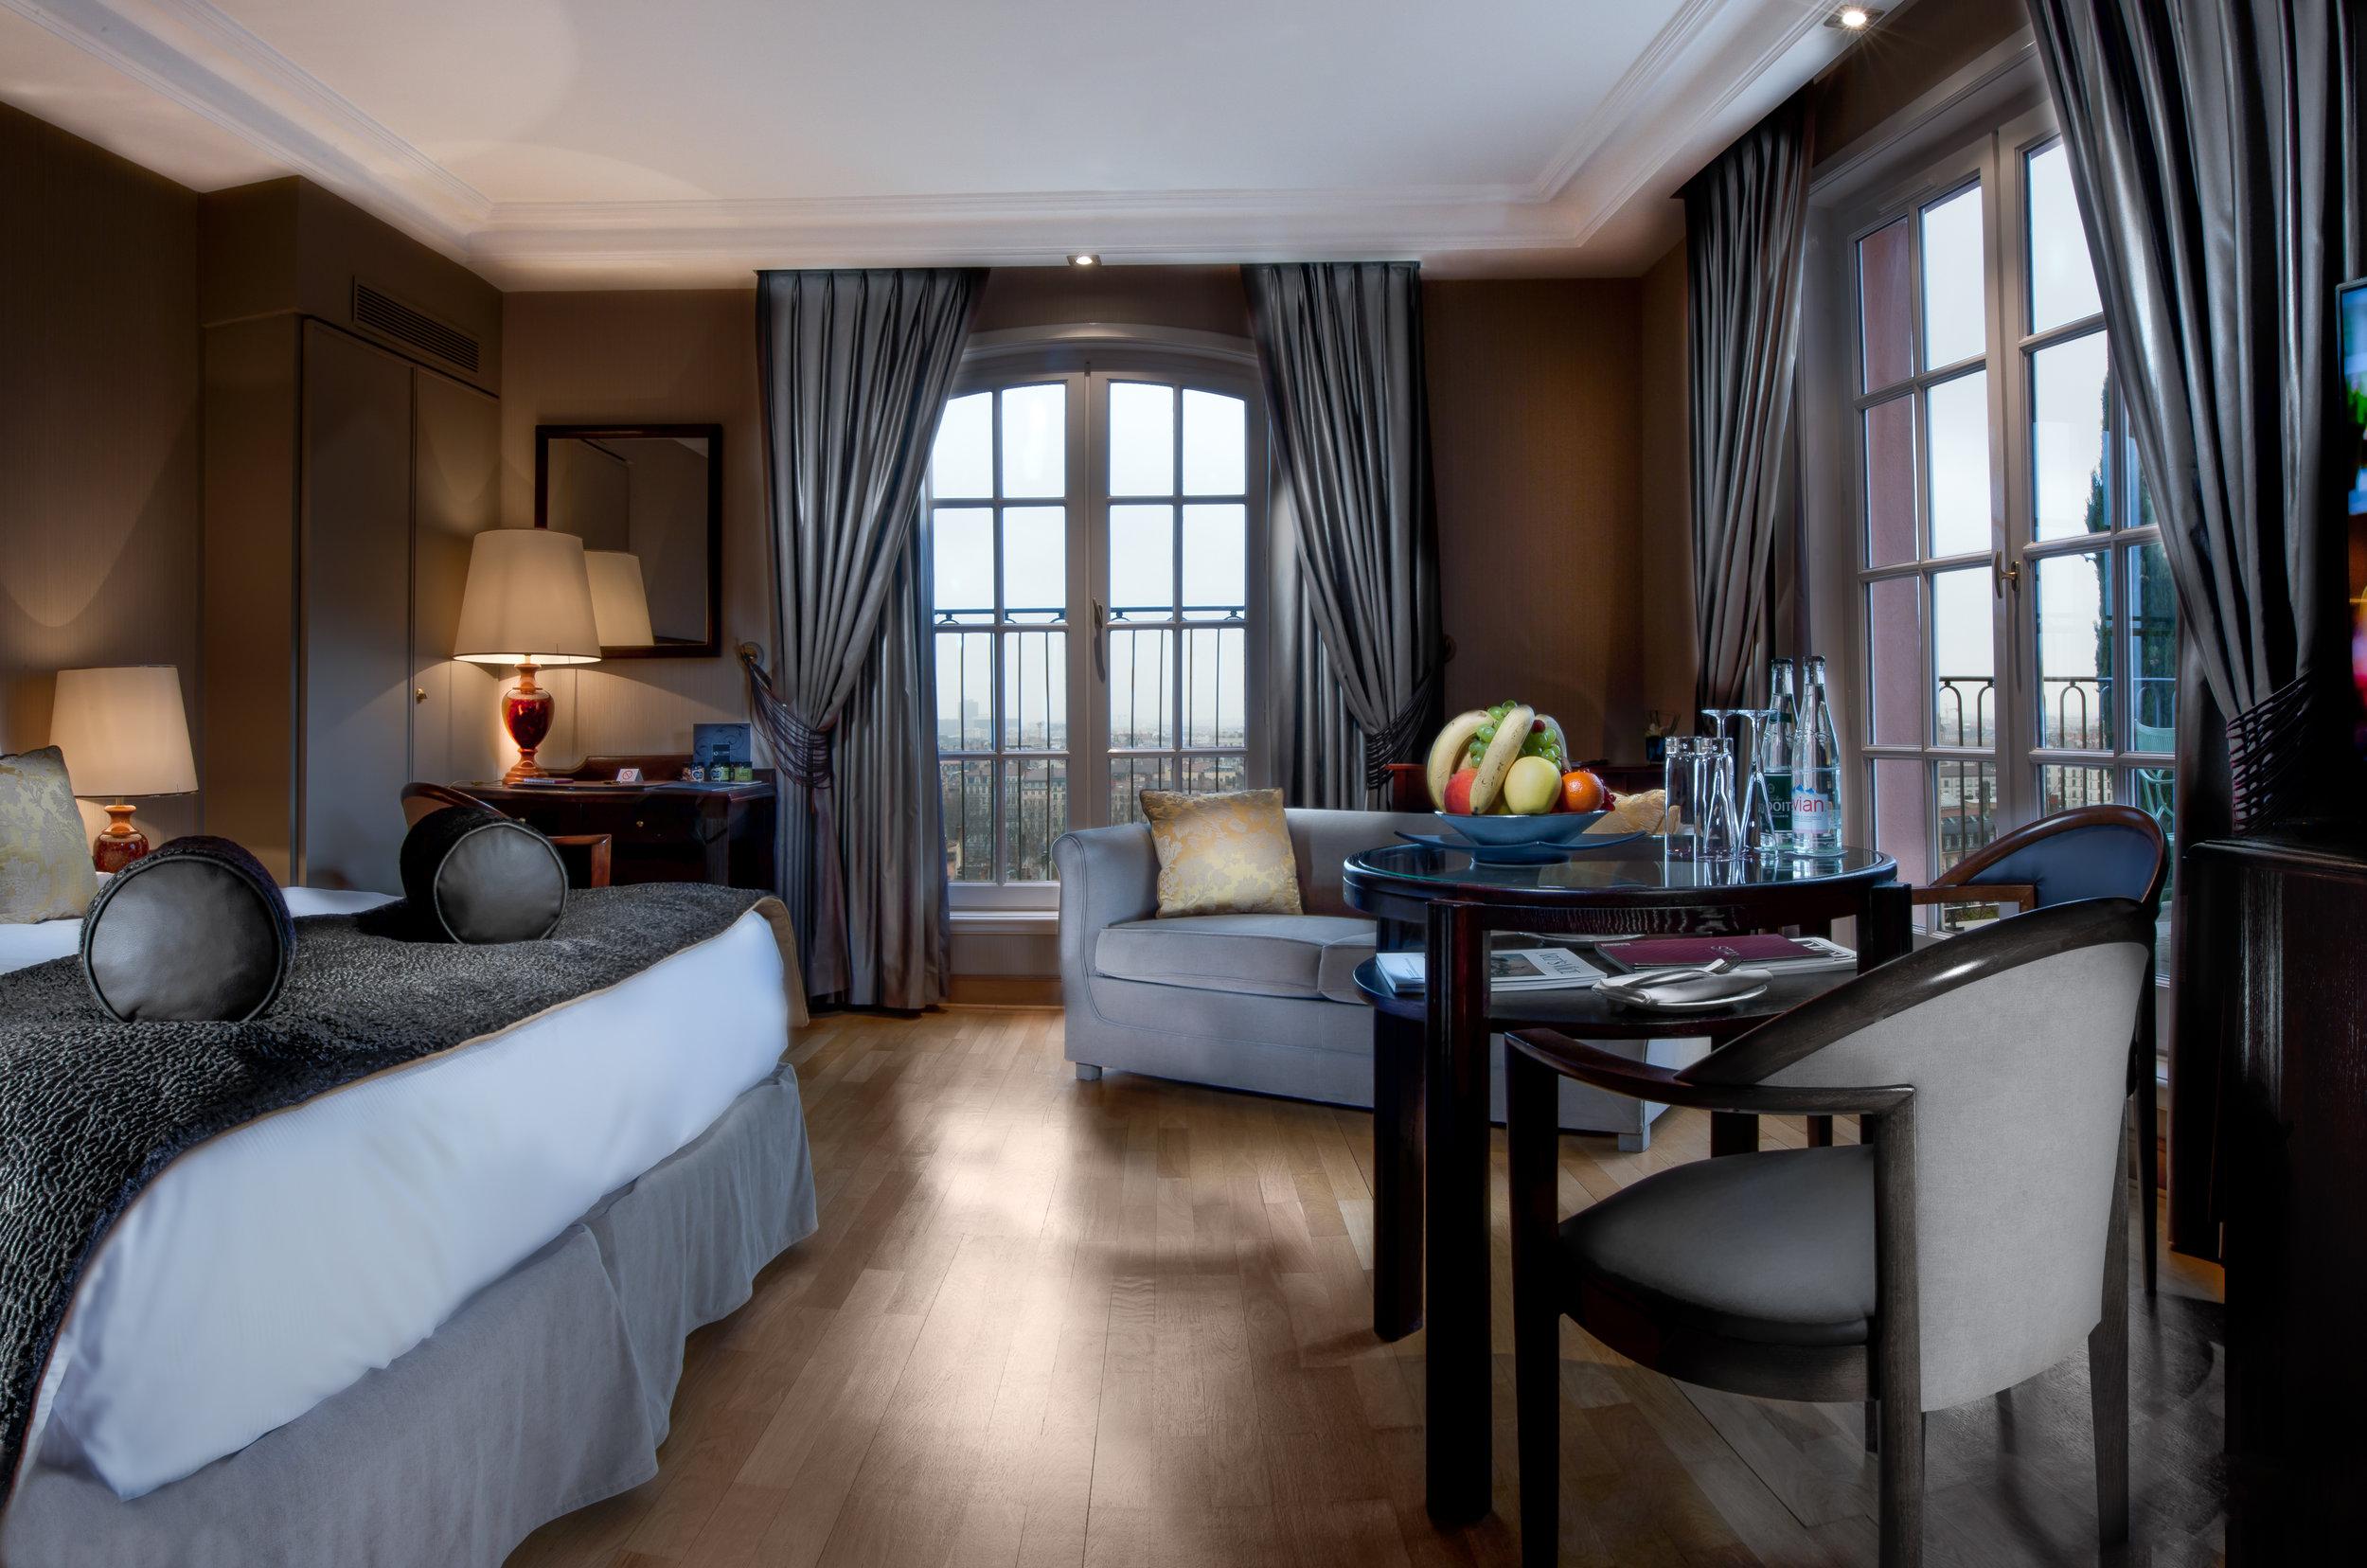 Hotel Villa Florentine 5* Lyon